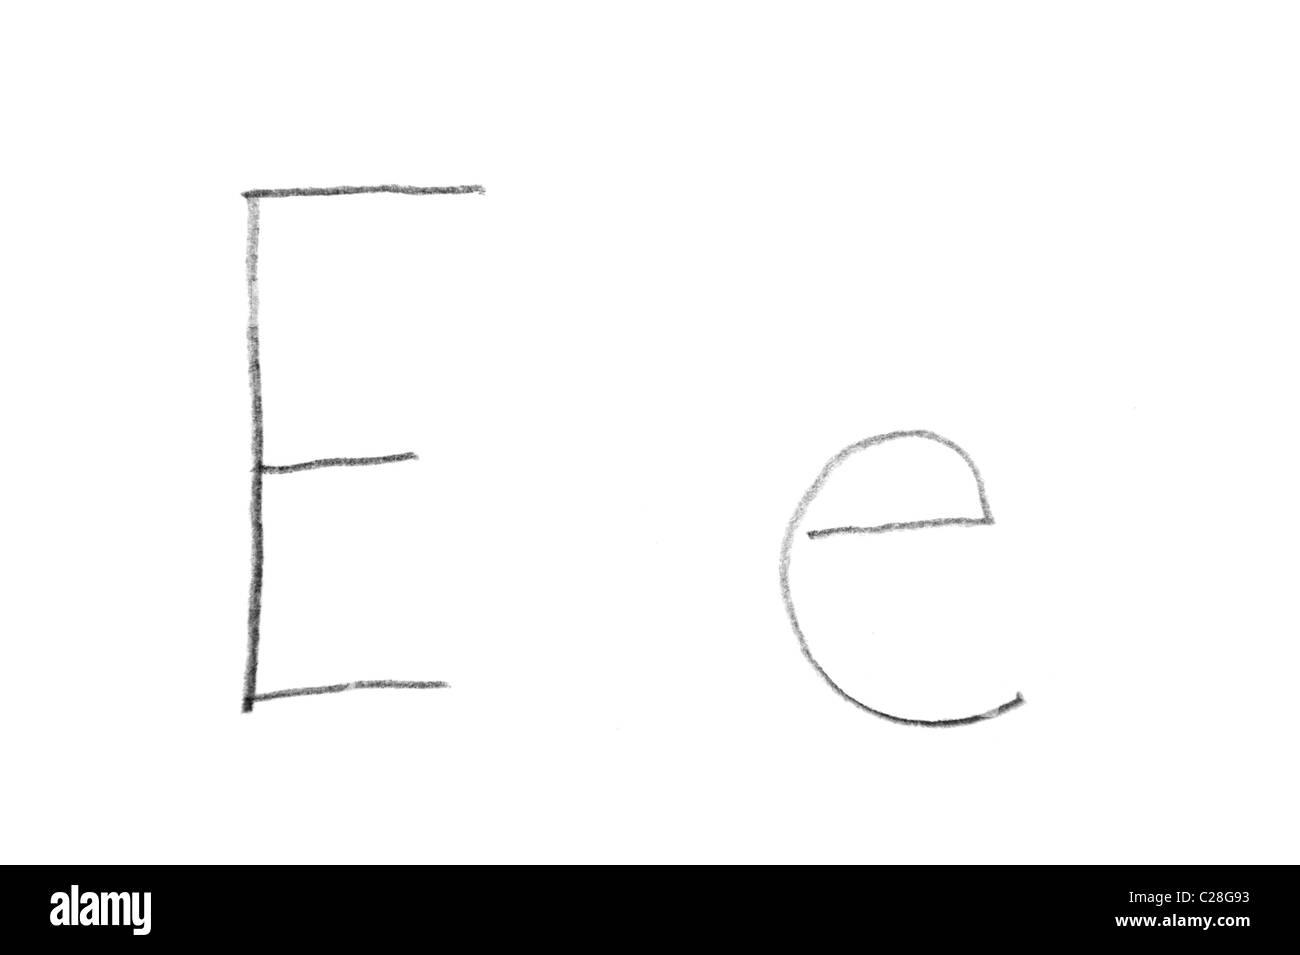 Hand written letter E, both upper and lower case  - Stock Image